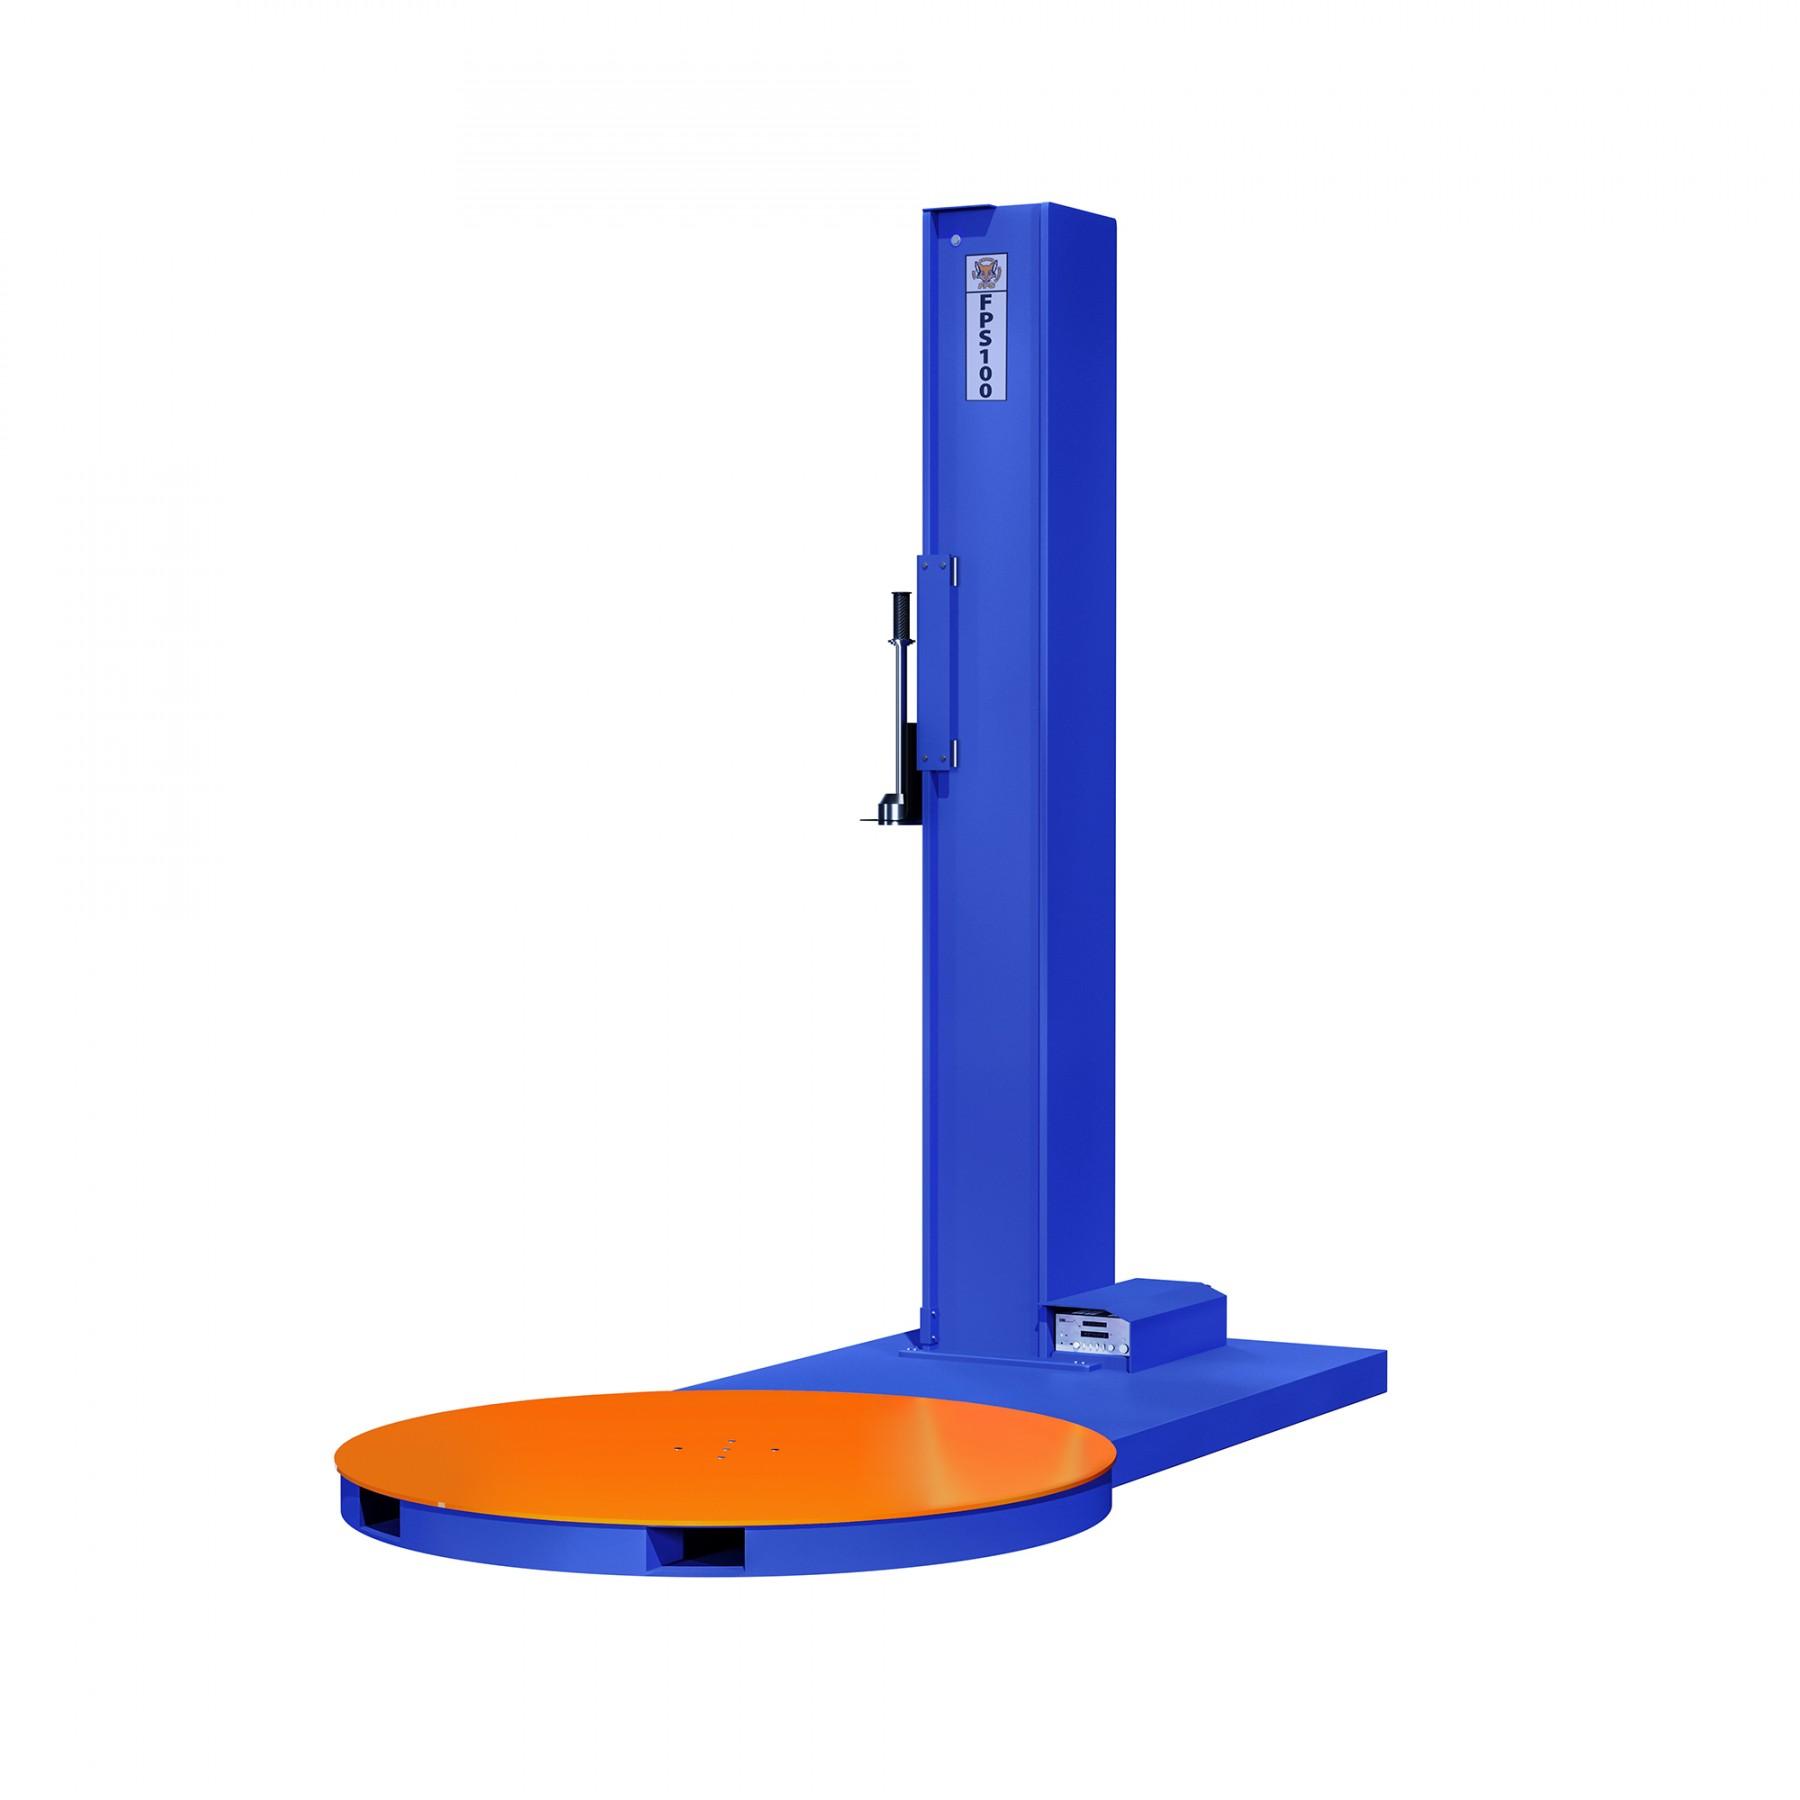 Stretch Wrapper - FOX FPS 100 Manual Low Profile Pallet Wrapper - 5000lb Capacity